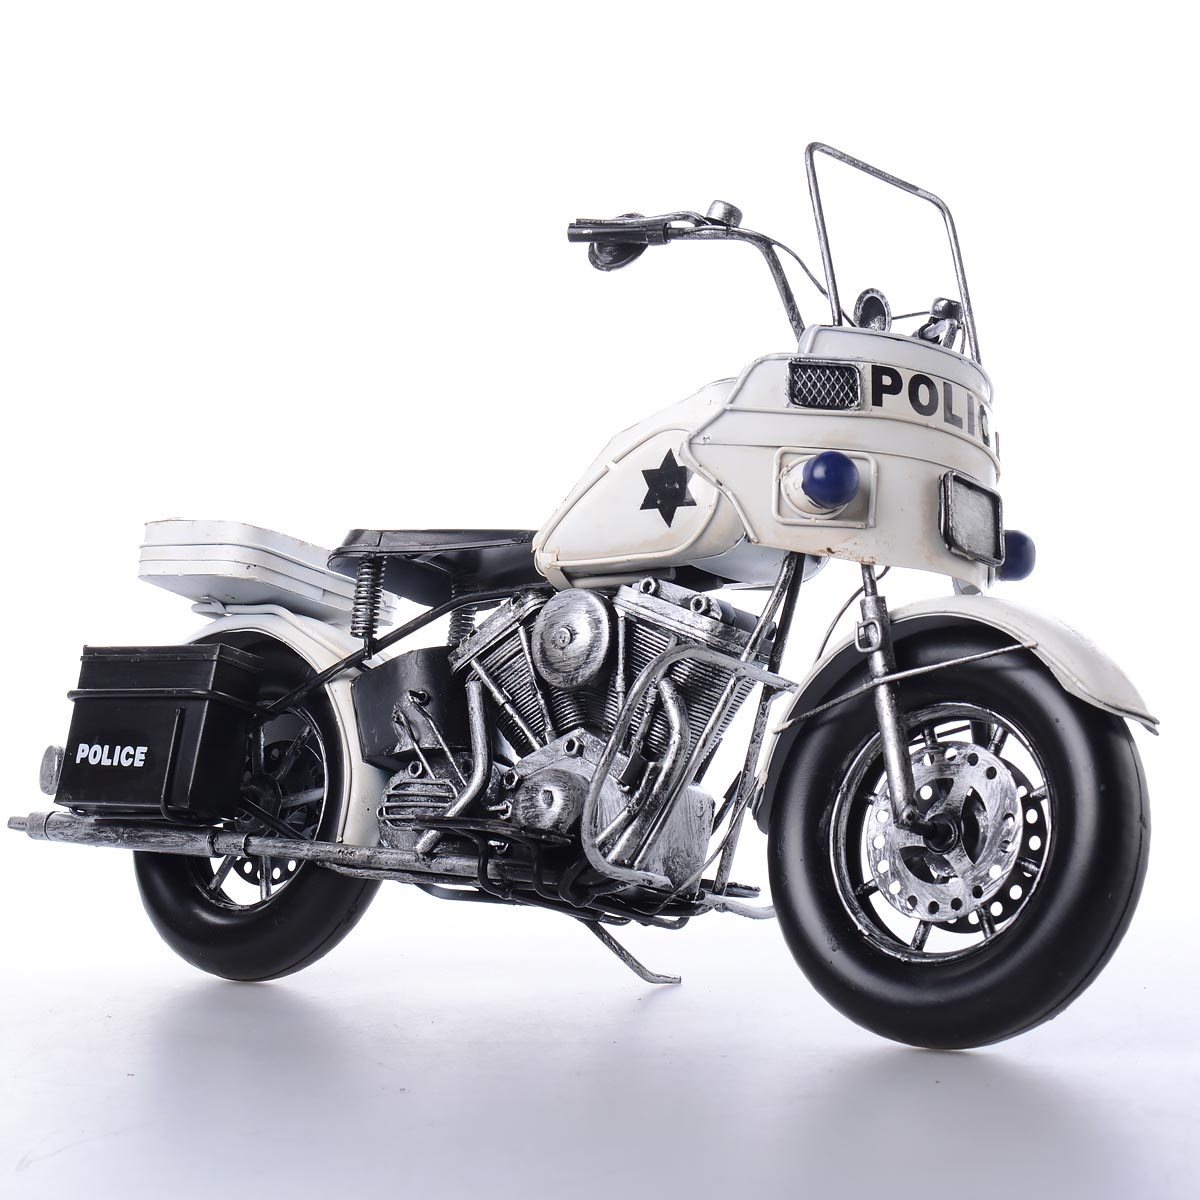 Vintage χειροποίητη διακοσμητική μοτοσυκλέτα αστυνομίας μεταλλική - OEM 51646